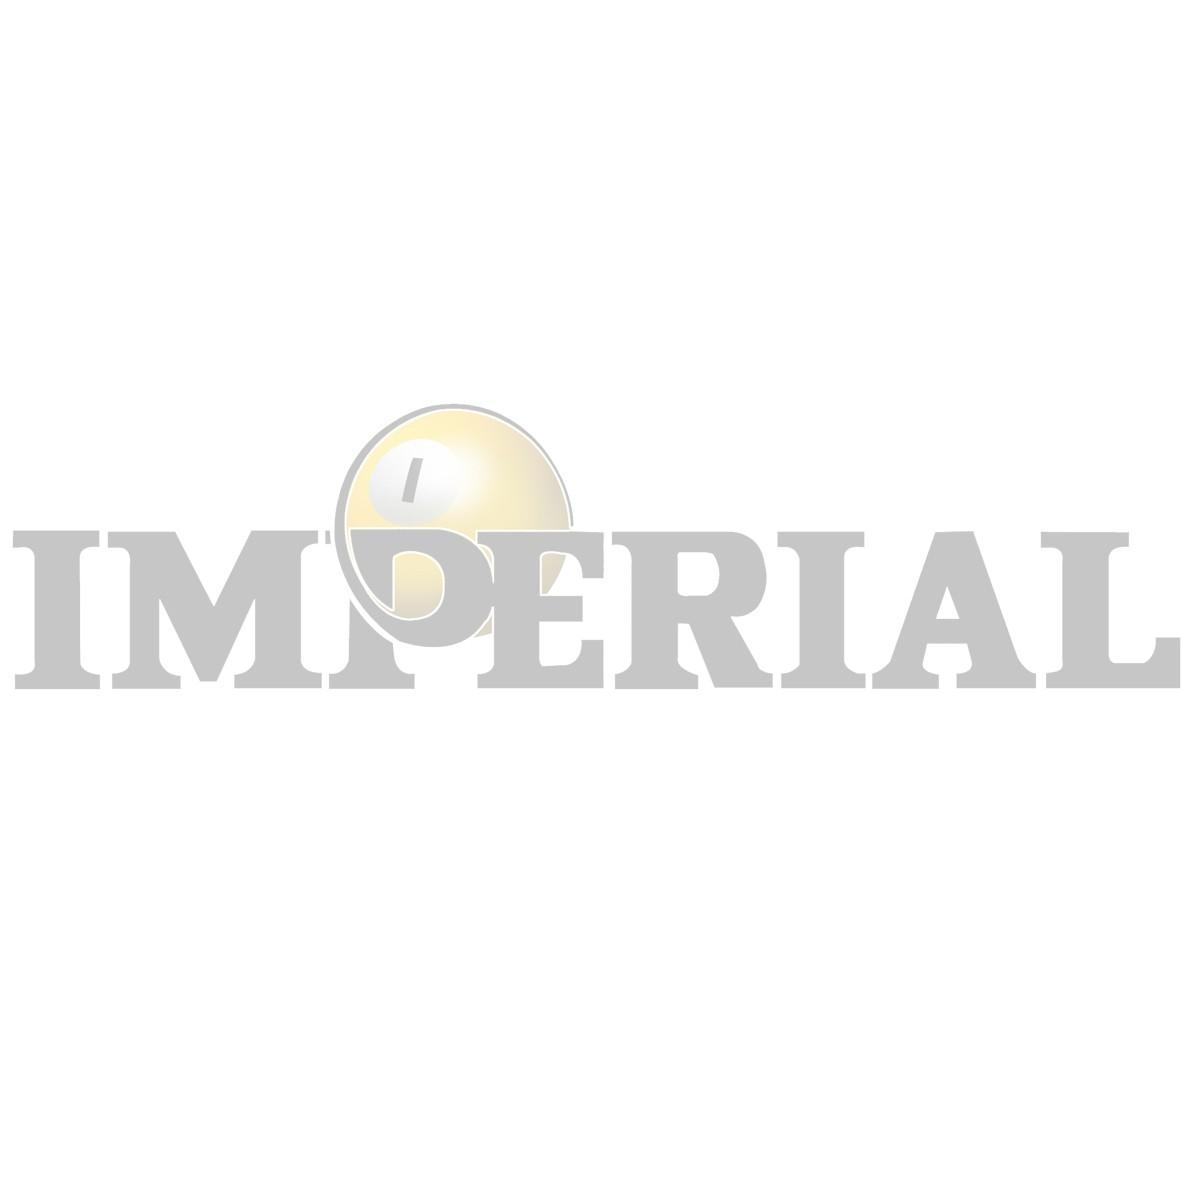 Pittsburgh Steelers Home vs. Away Billiard Ball Set